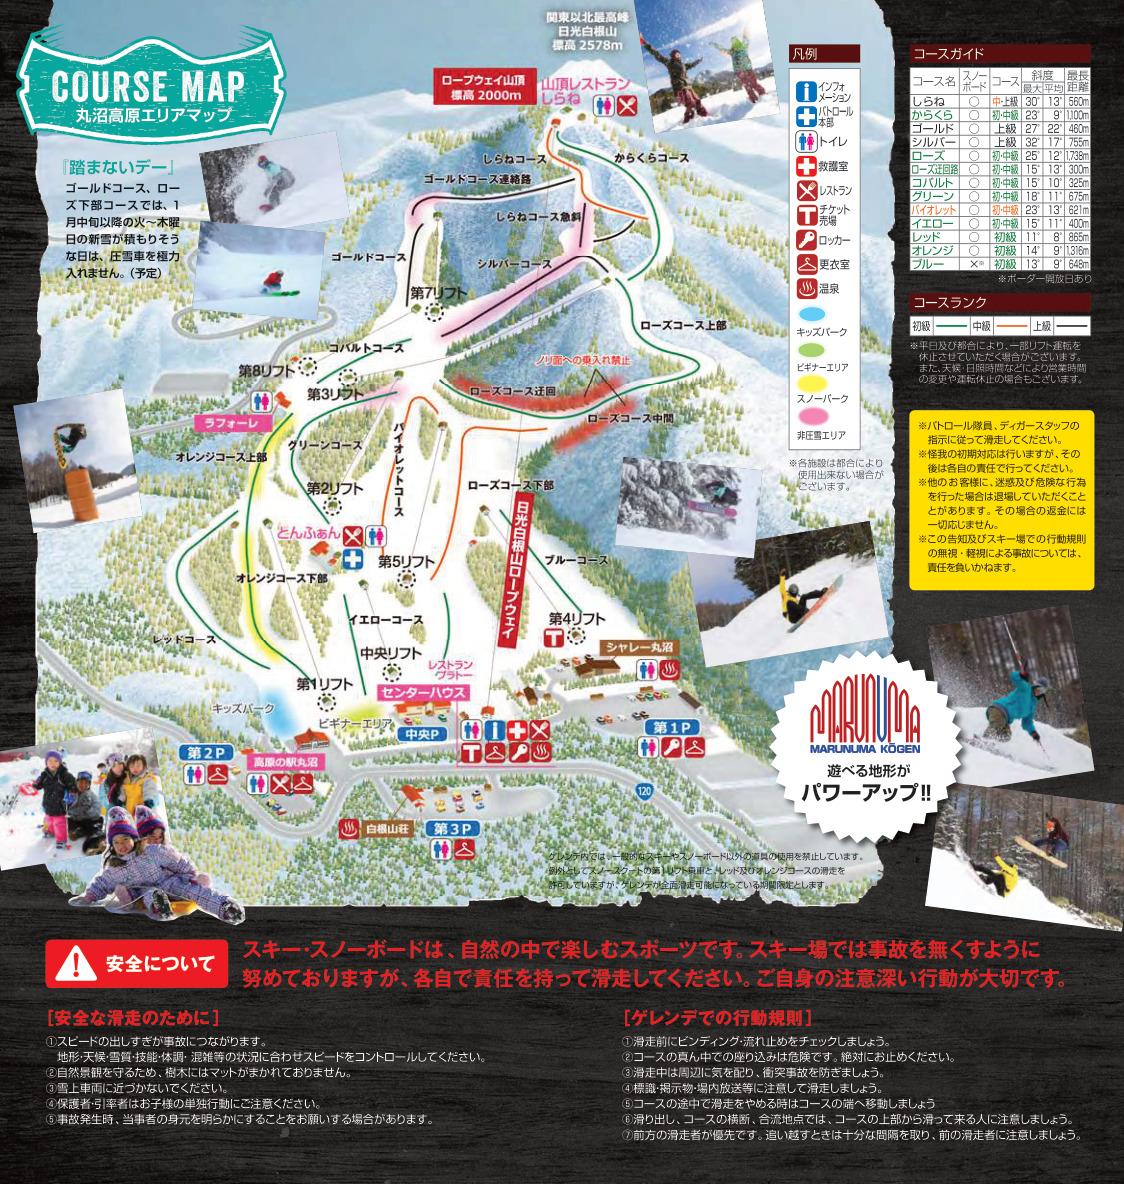 Marunuma Kogen Piste / Trail Map